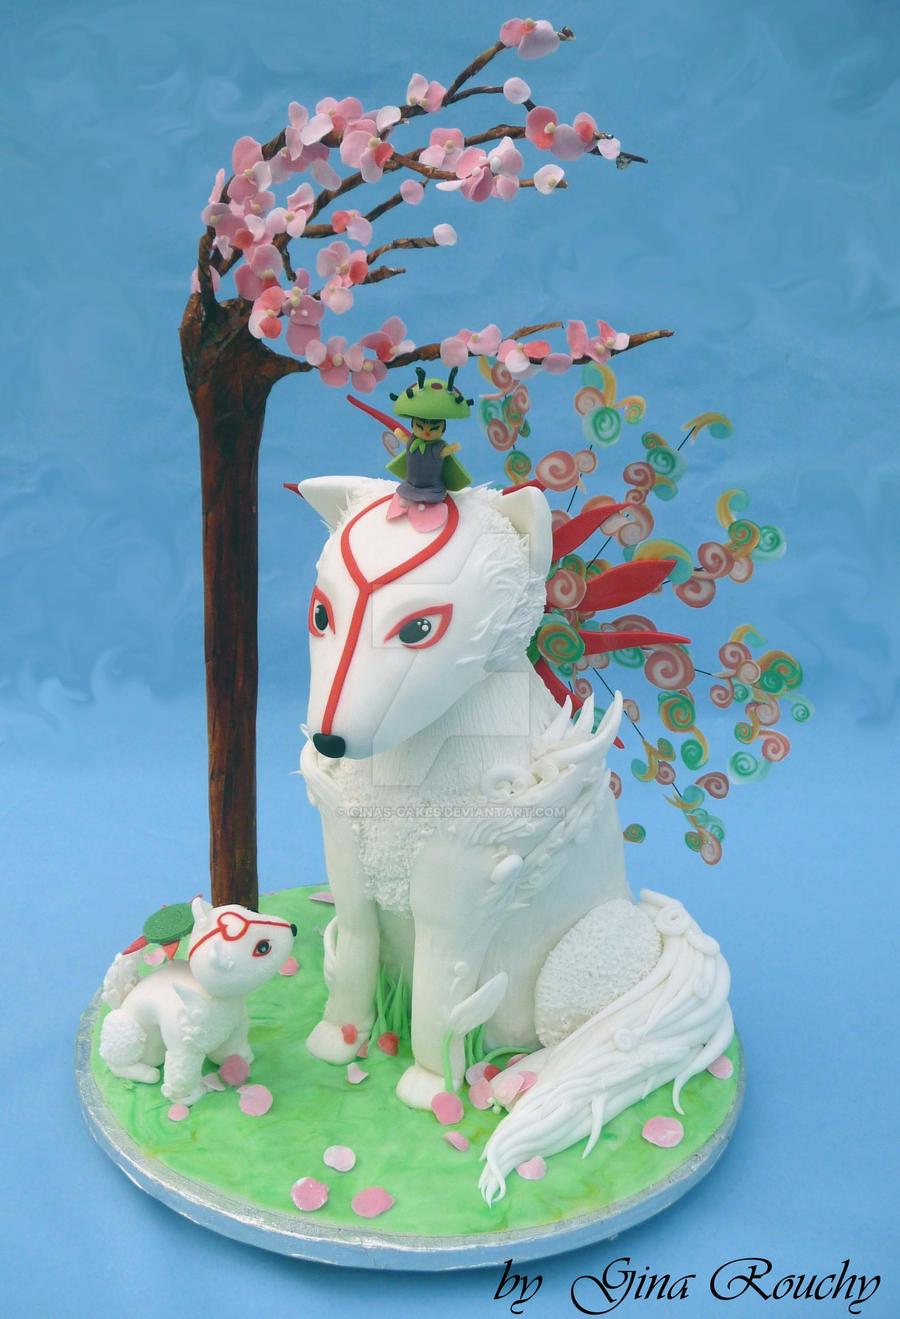 Okami and baby cake by ginas-cakes